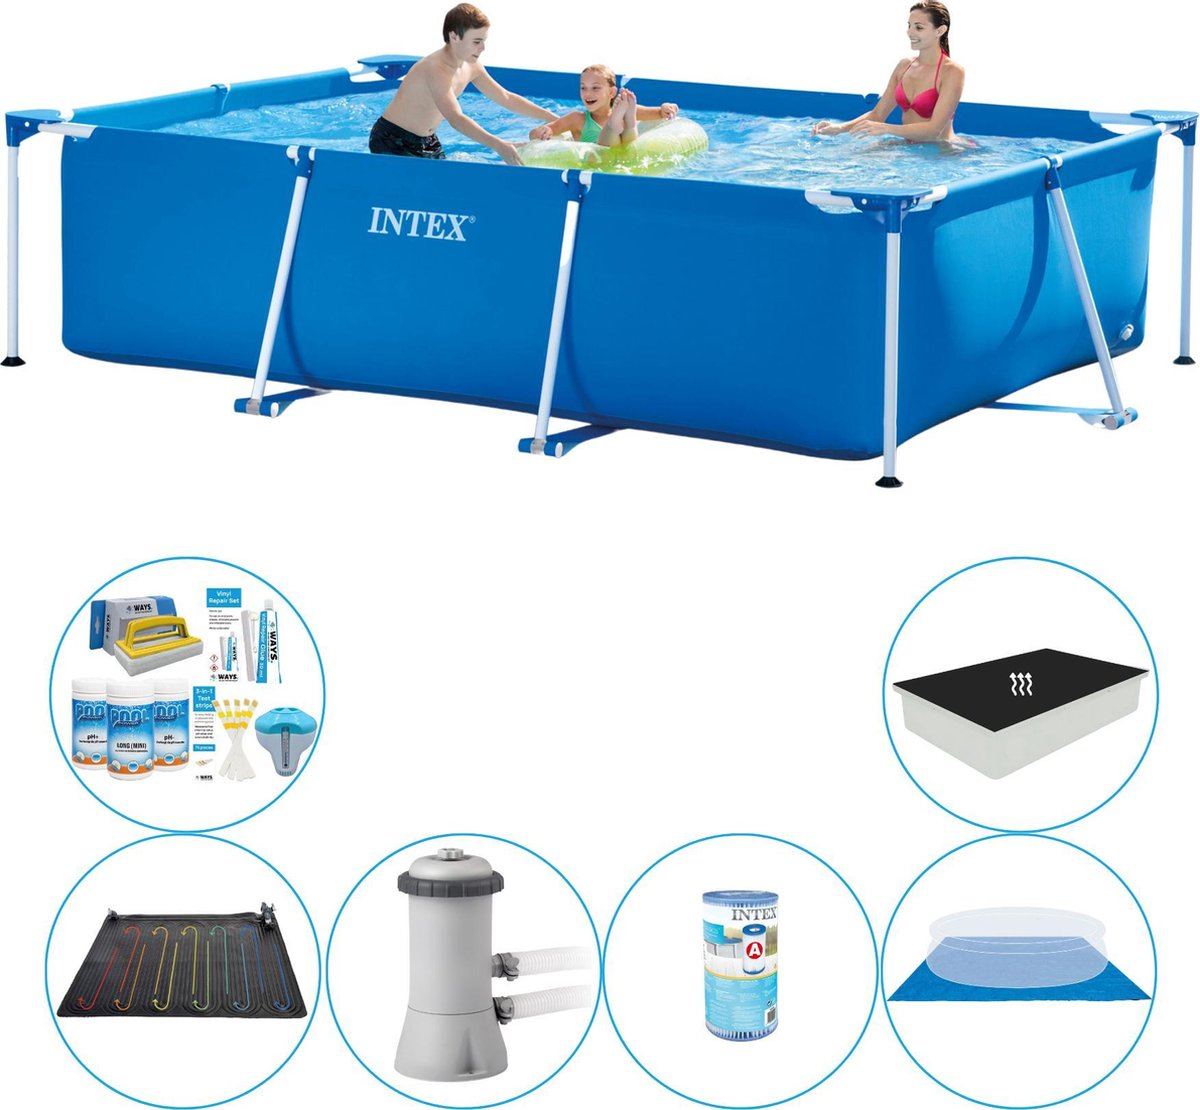 Intex Frame Pool Rechthoekig 300x200x75 cm - Slimme Zwembad Deal